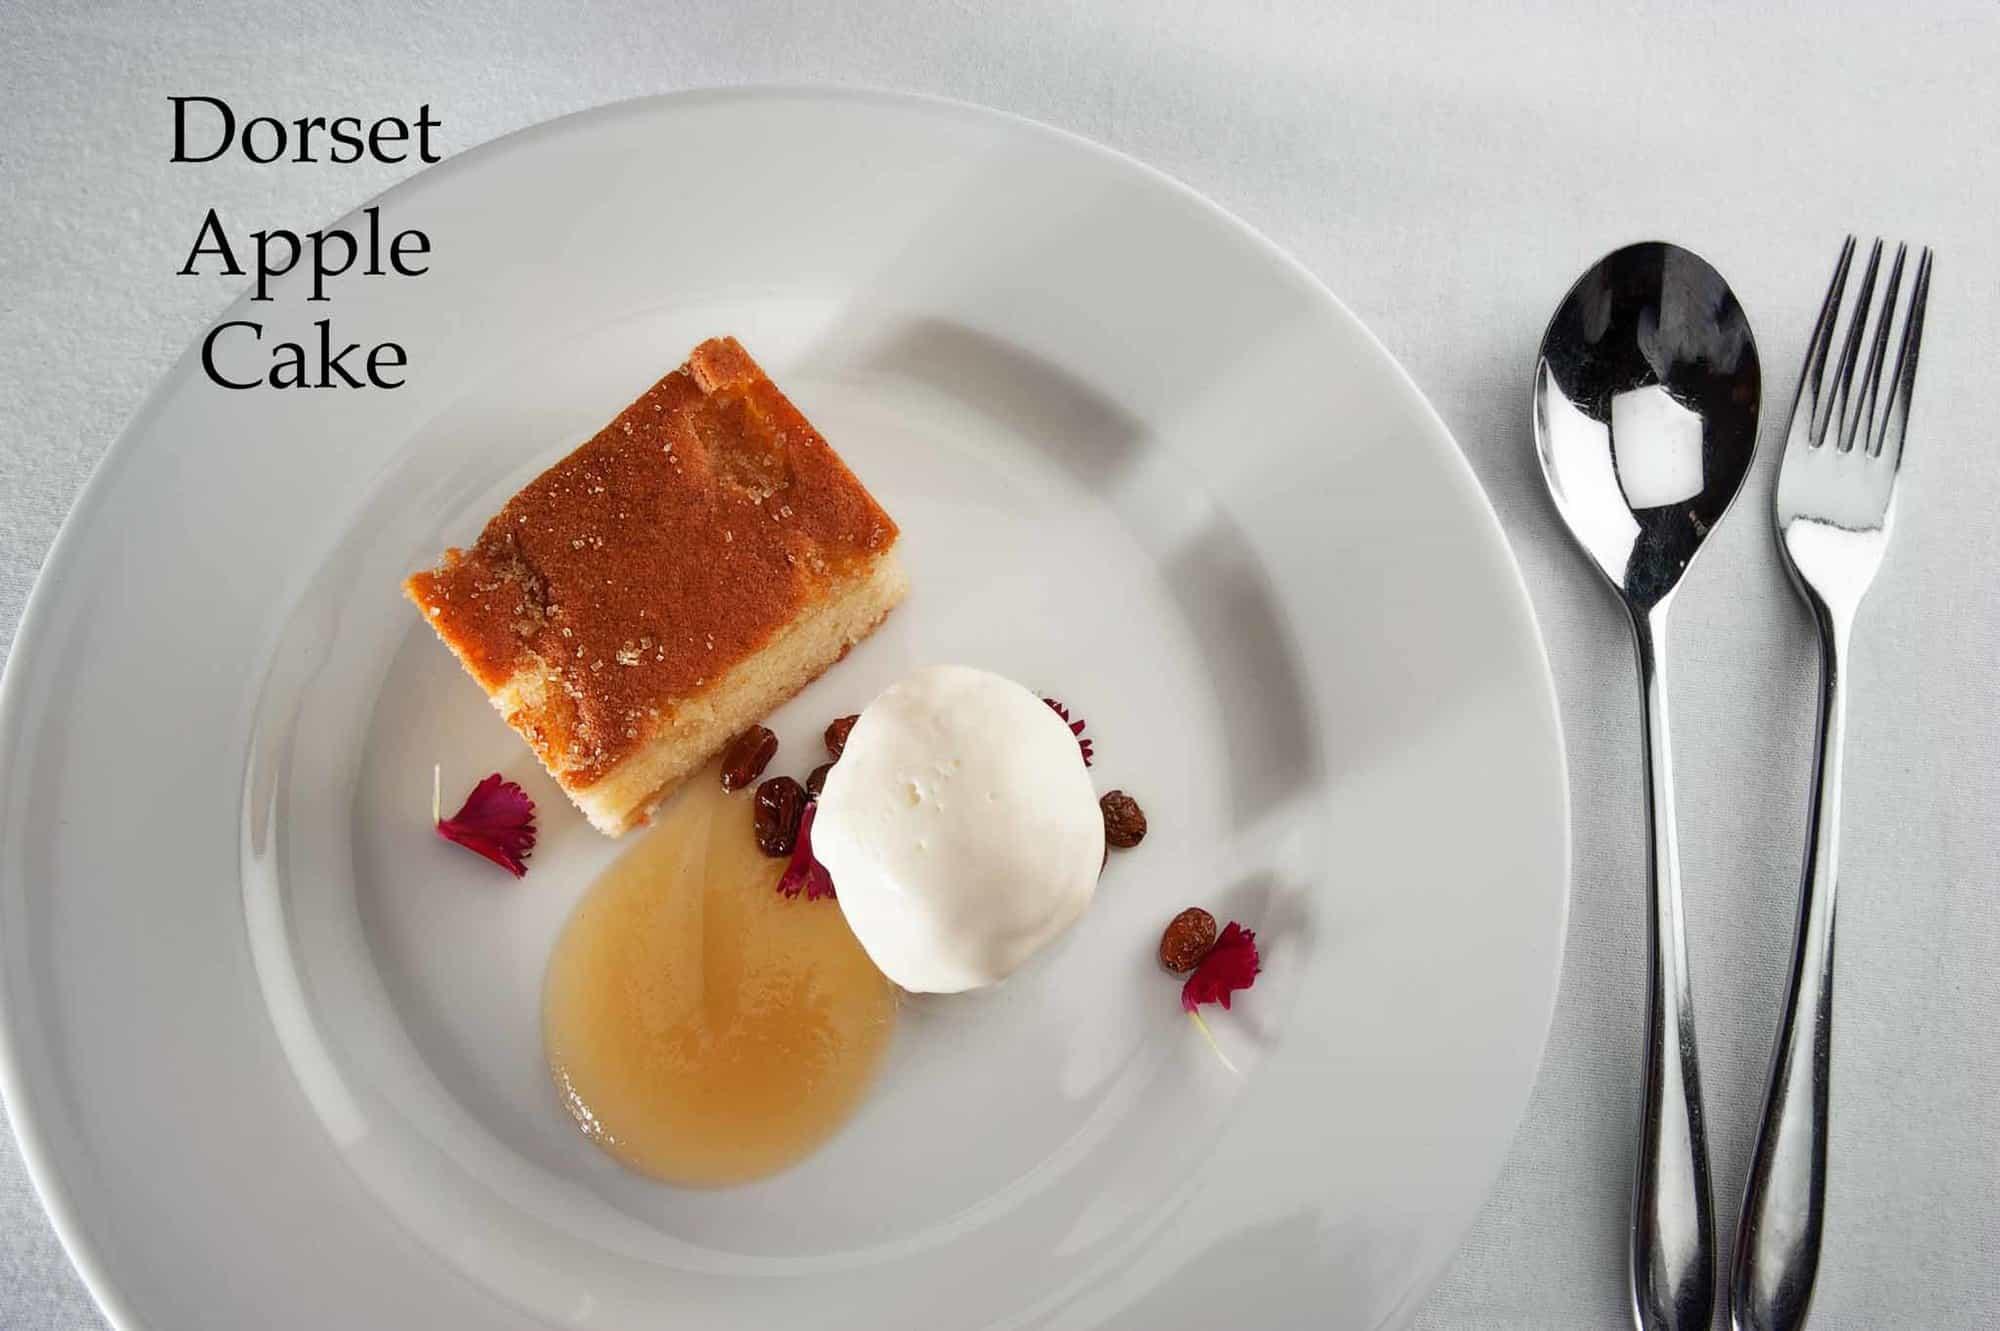 Dorset-Apple-Cake (1)